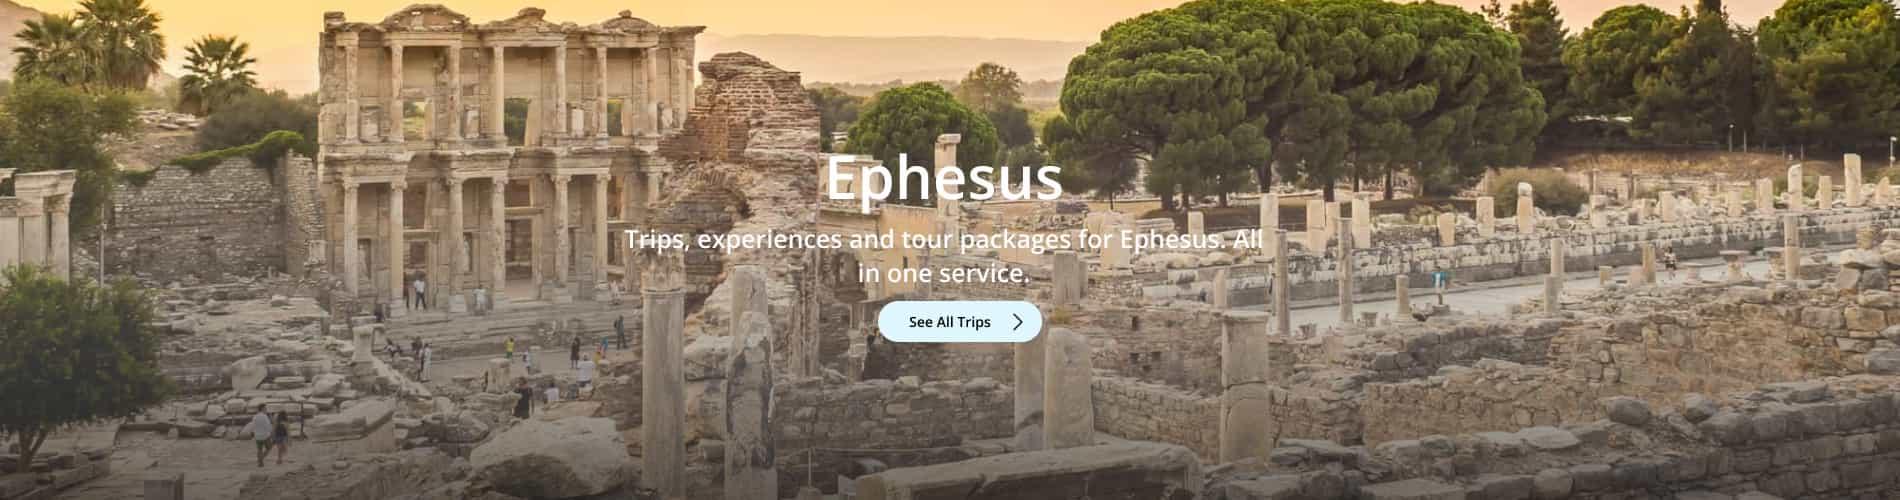 Ephesus Trips